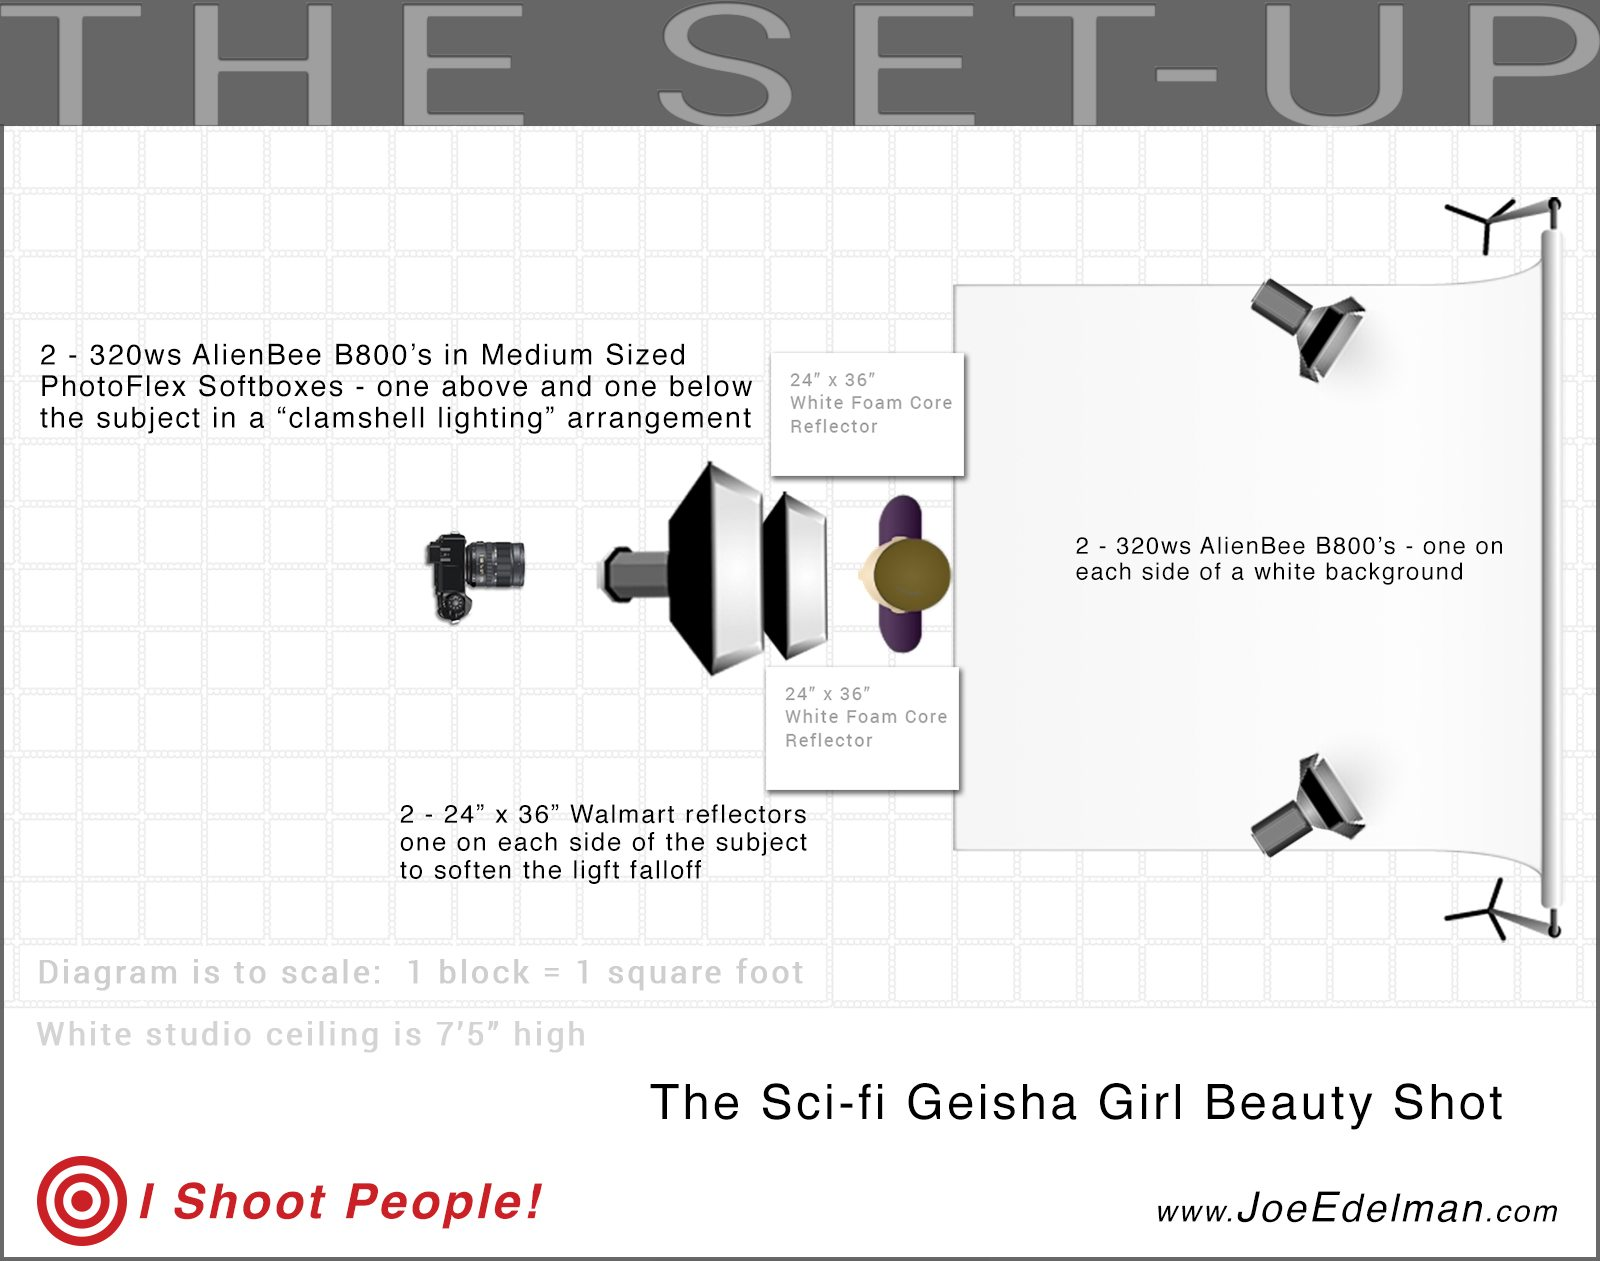 Lighting Diagram for the Sci-Fi Geisha Girl